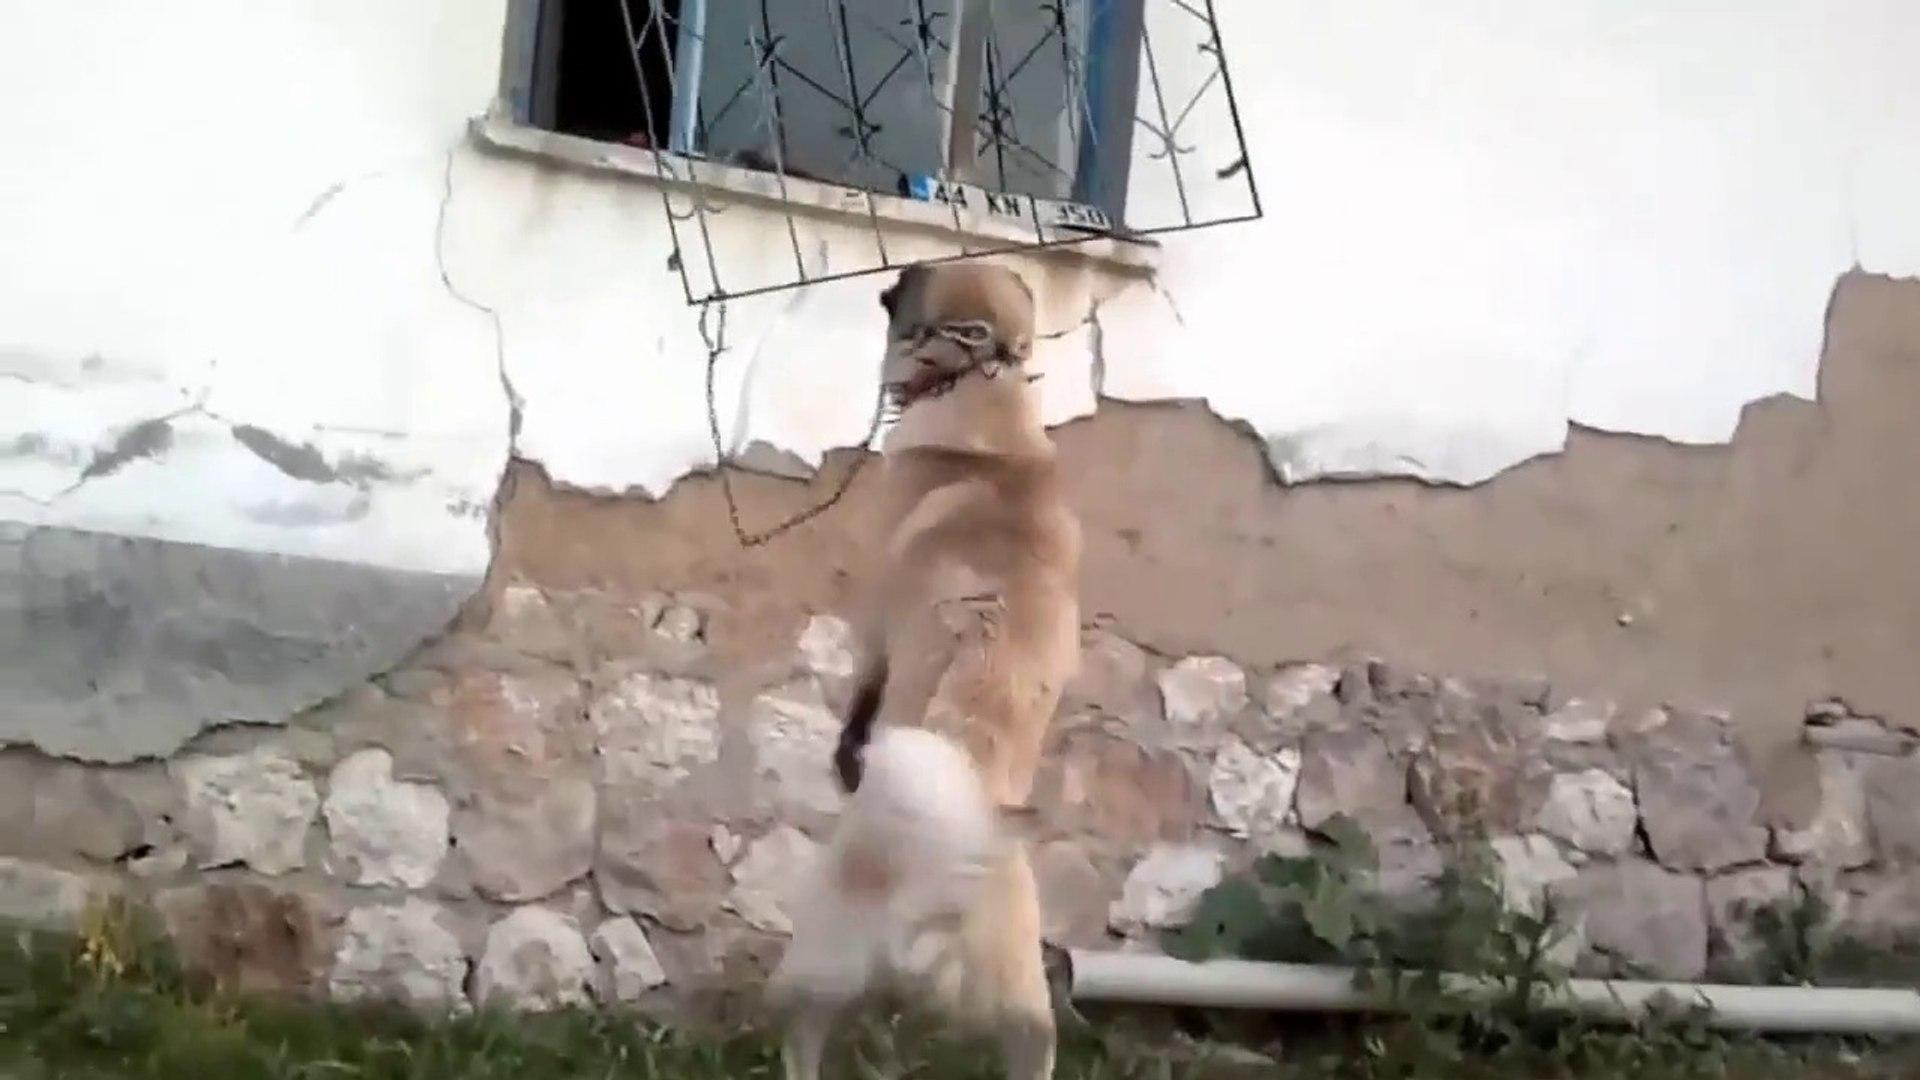 COBAN KOPEGiNiN GUCUNE KORKULUKLAR DAYANAMADI - ANATOLiAN SHEPHERD DOG